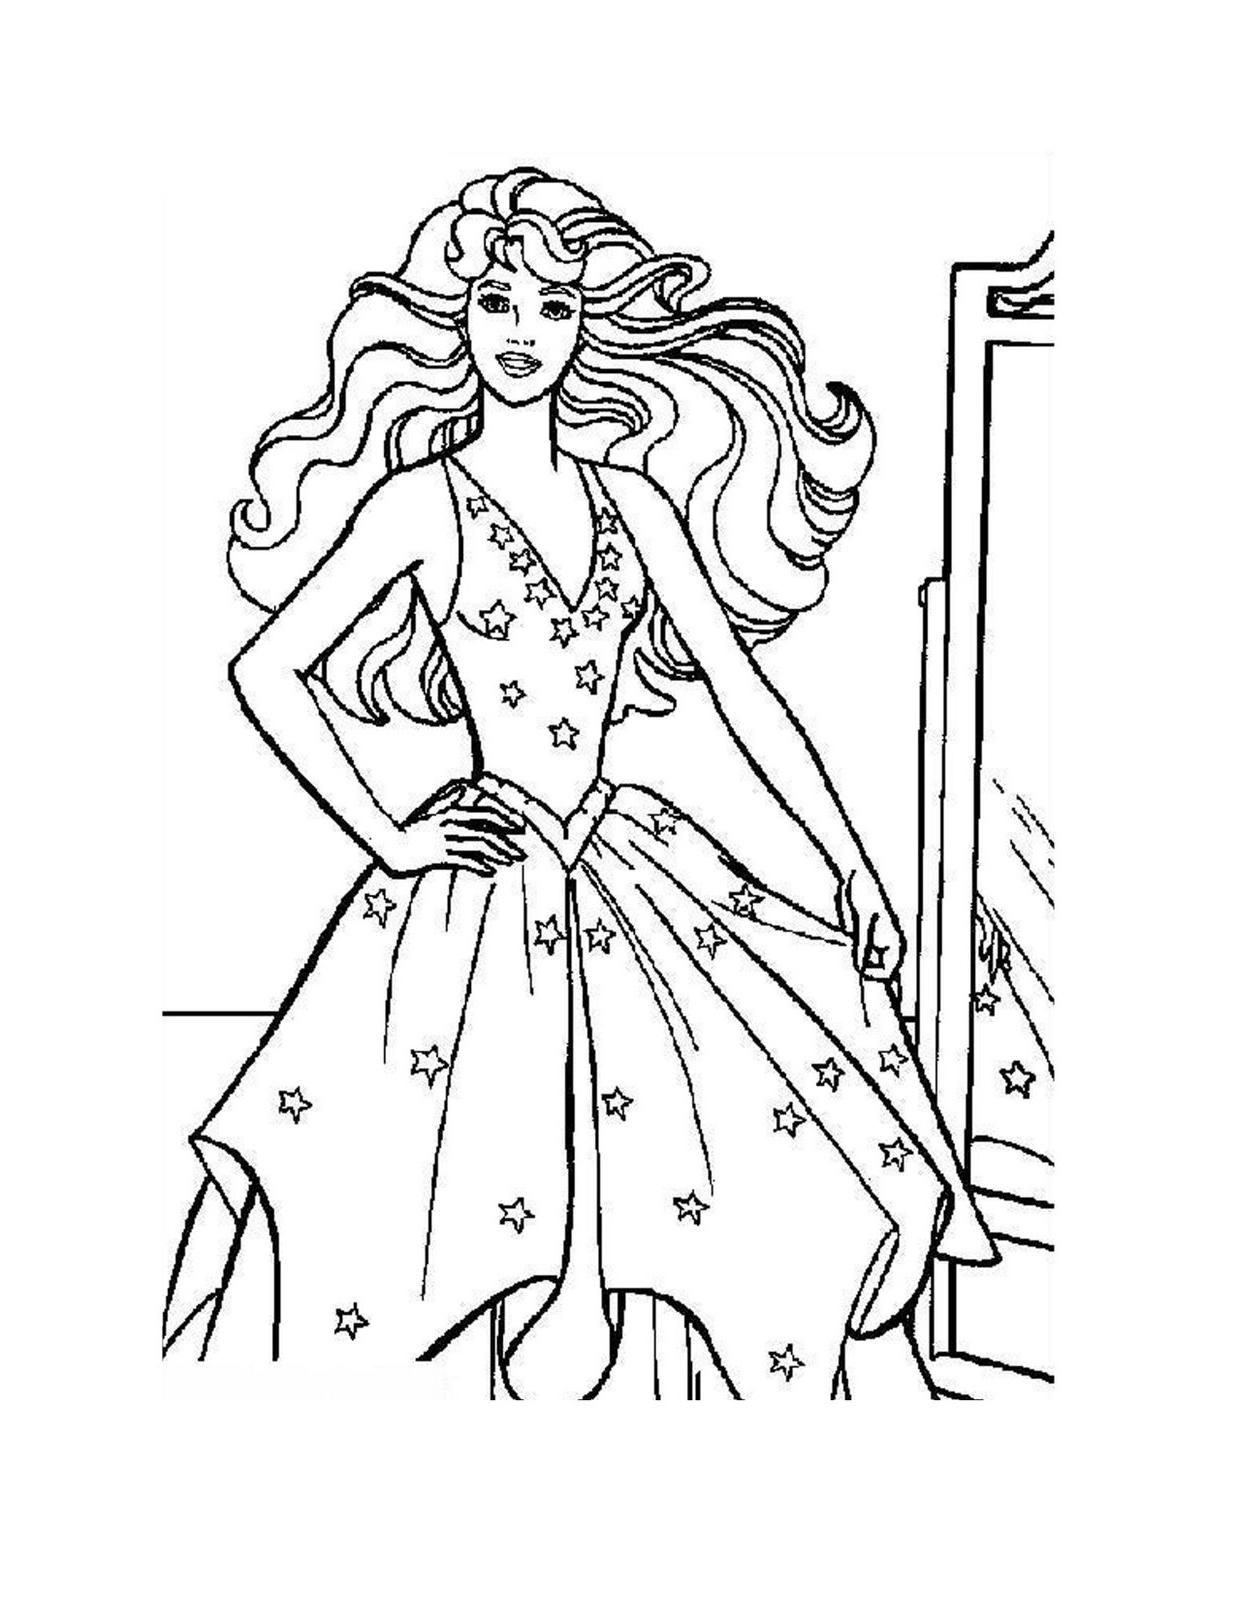 Disney Princess Coloring Pages at GetDrawings | Free download